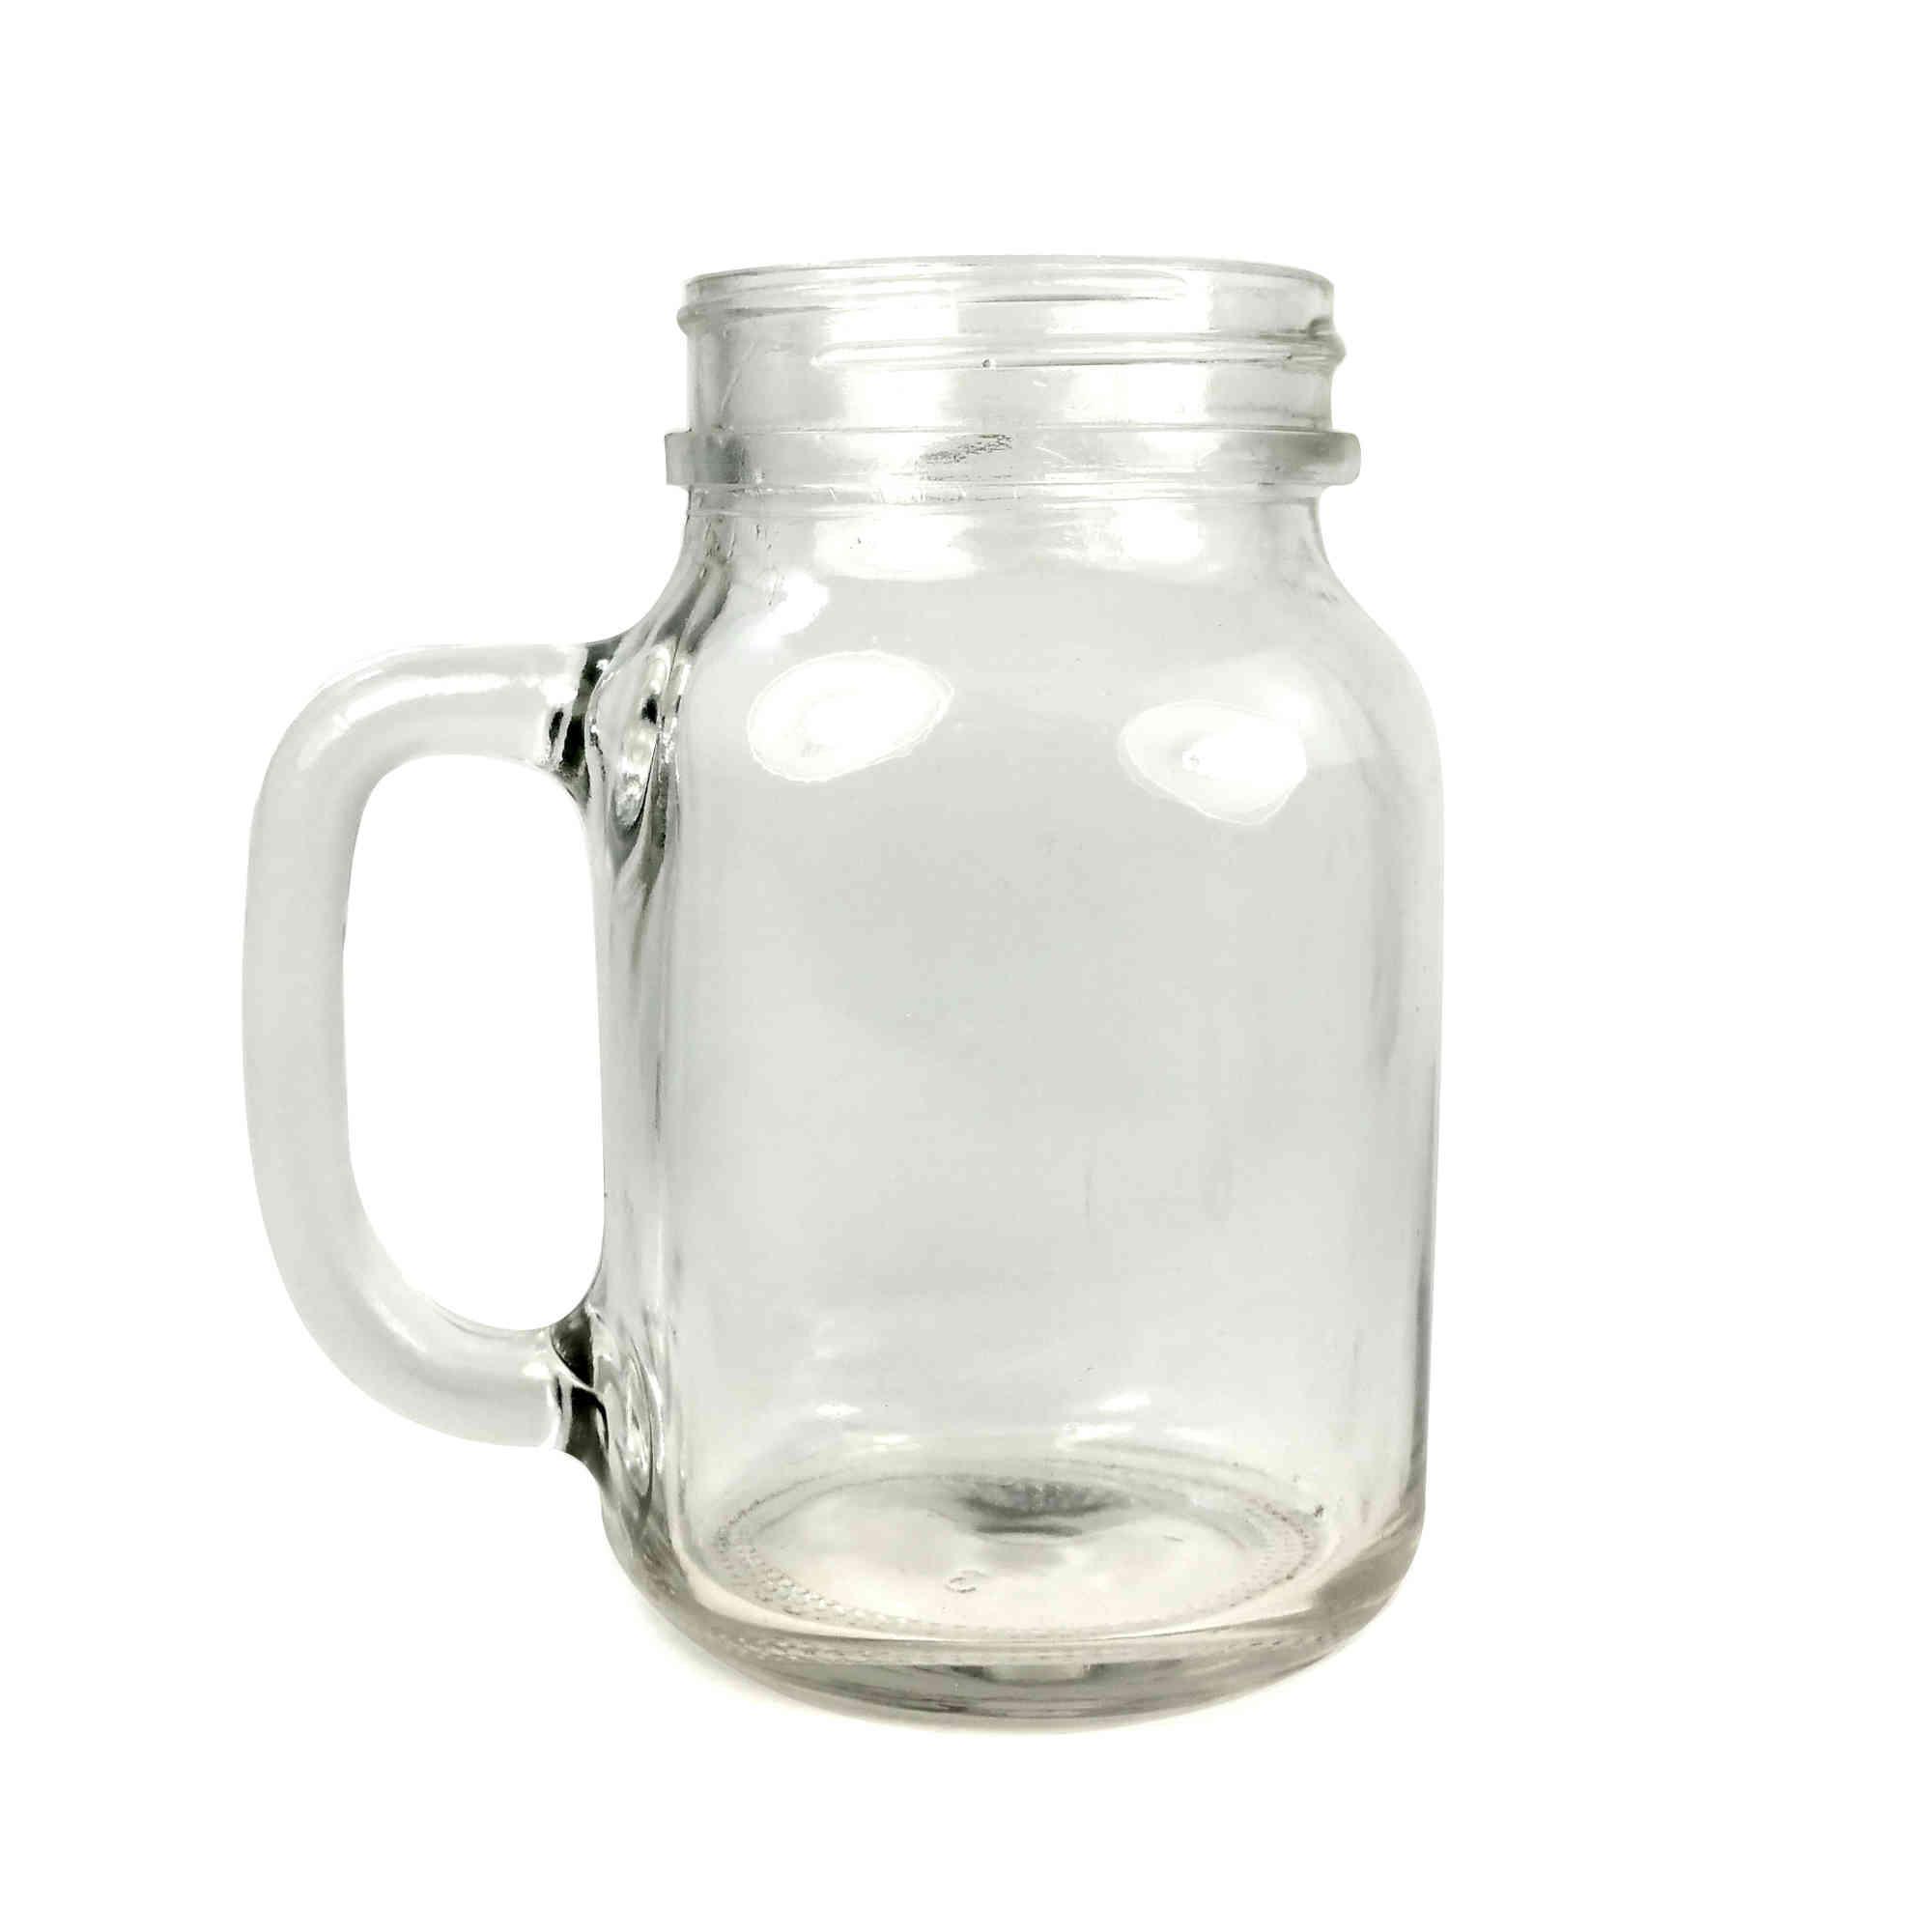 Tuff luv mason drinking jar glasses 20oz 568ml ebay - Mason jar goblets ...